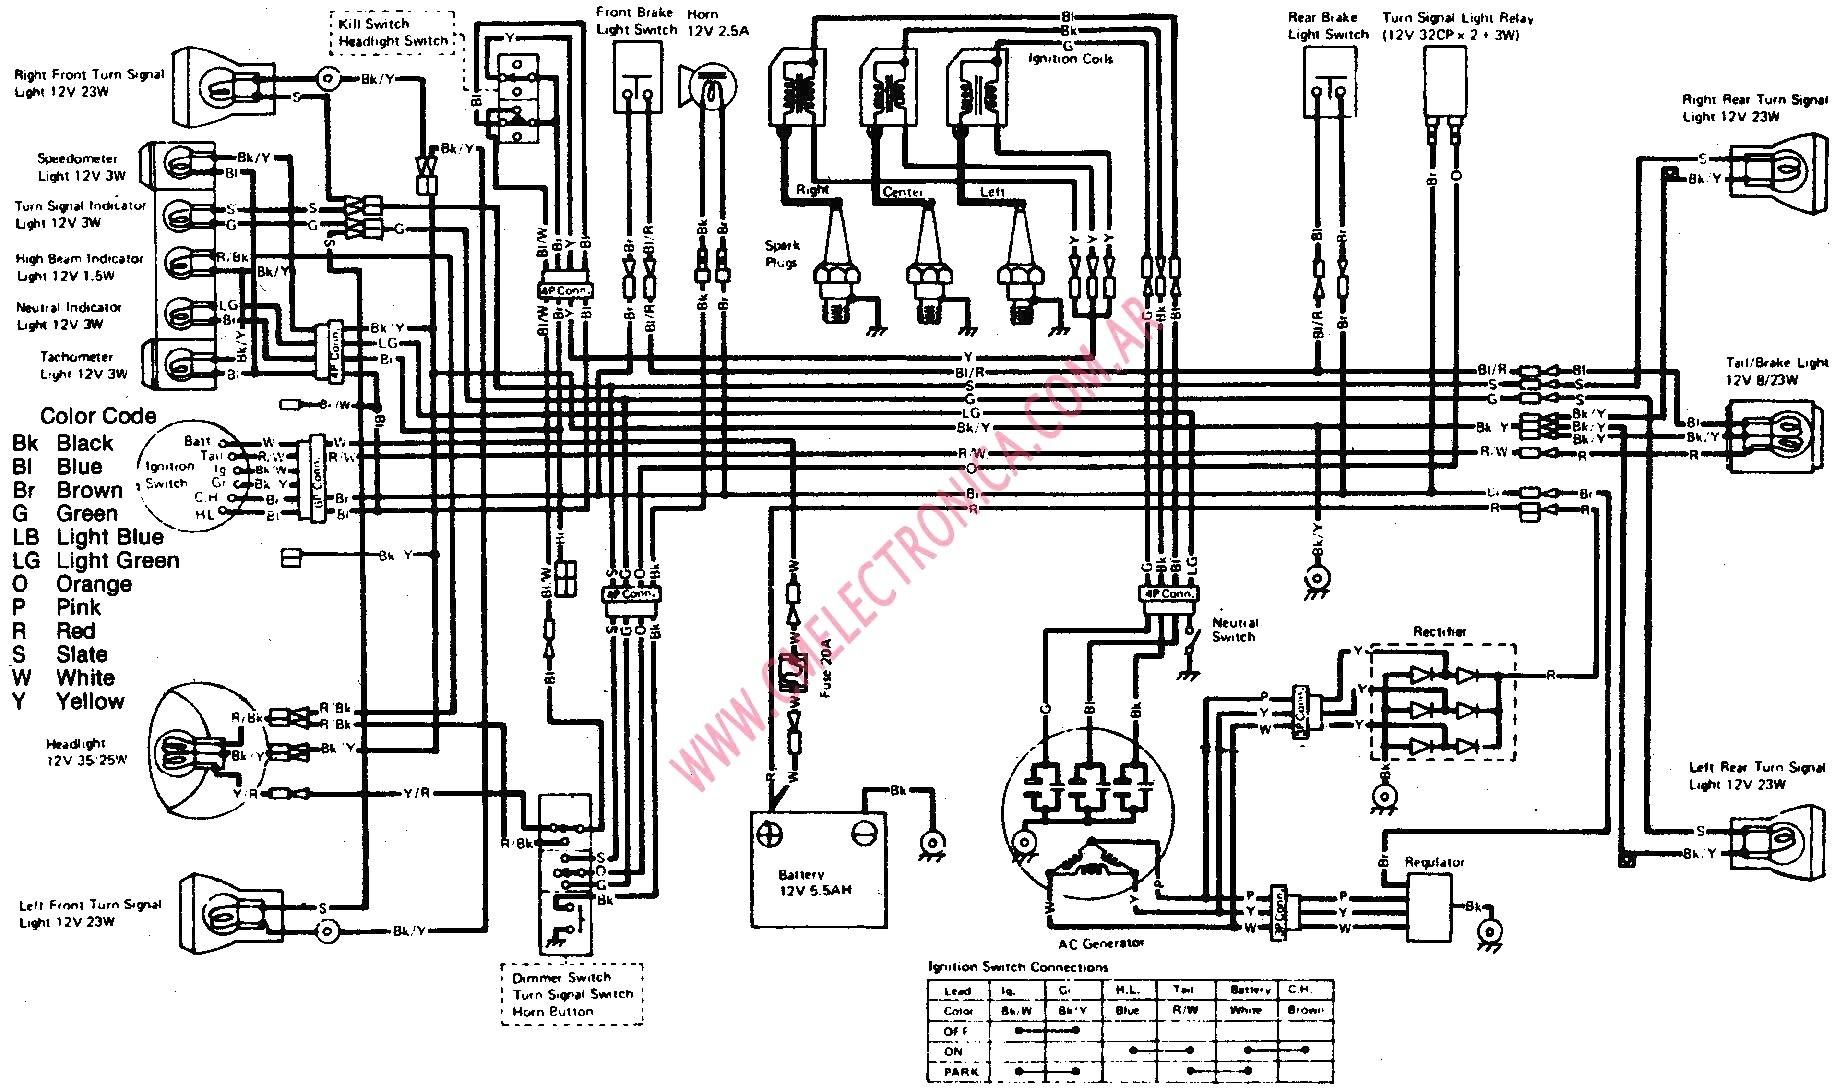 [DIAGRAM] 1987 Kawasaki Bayou 220 Wiring Diagram FULL